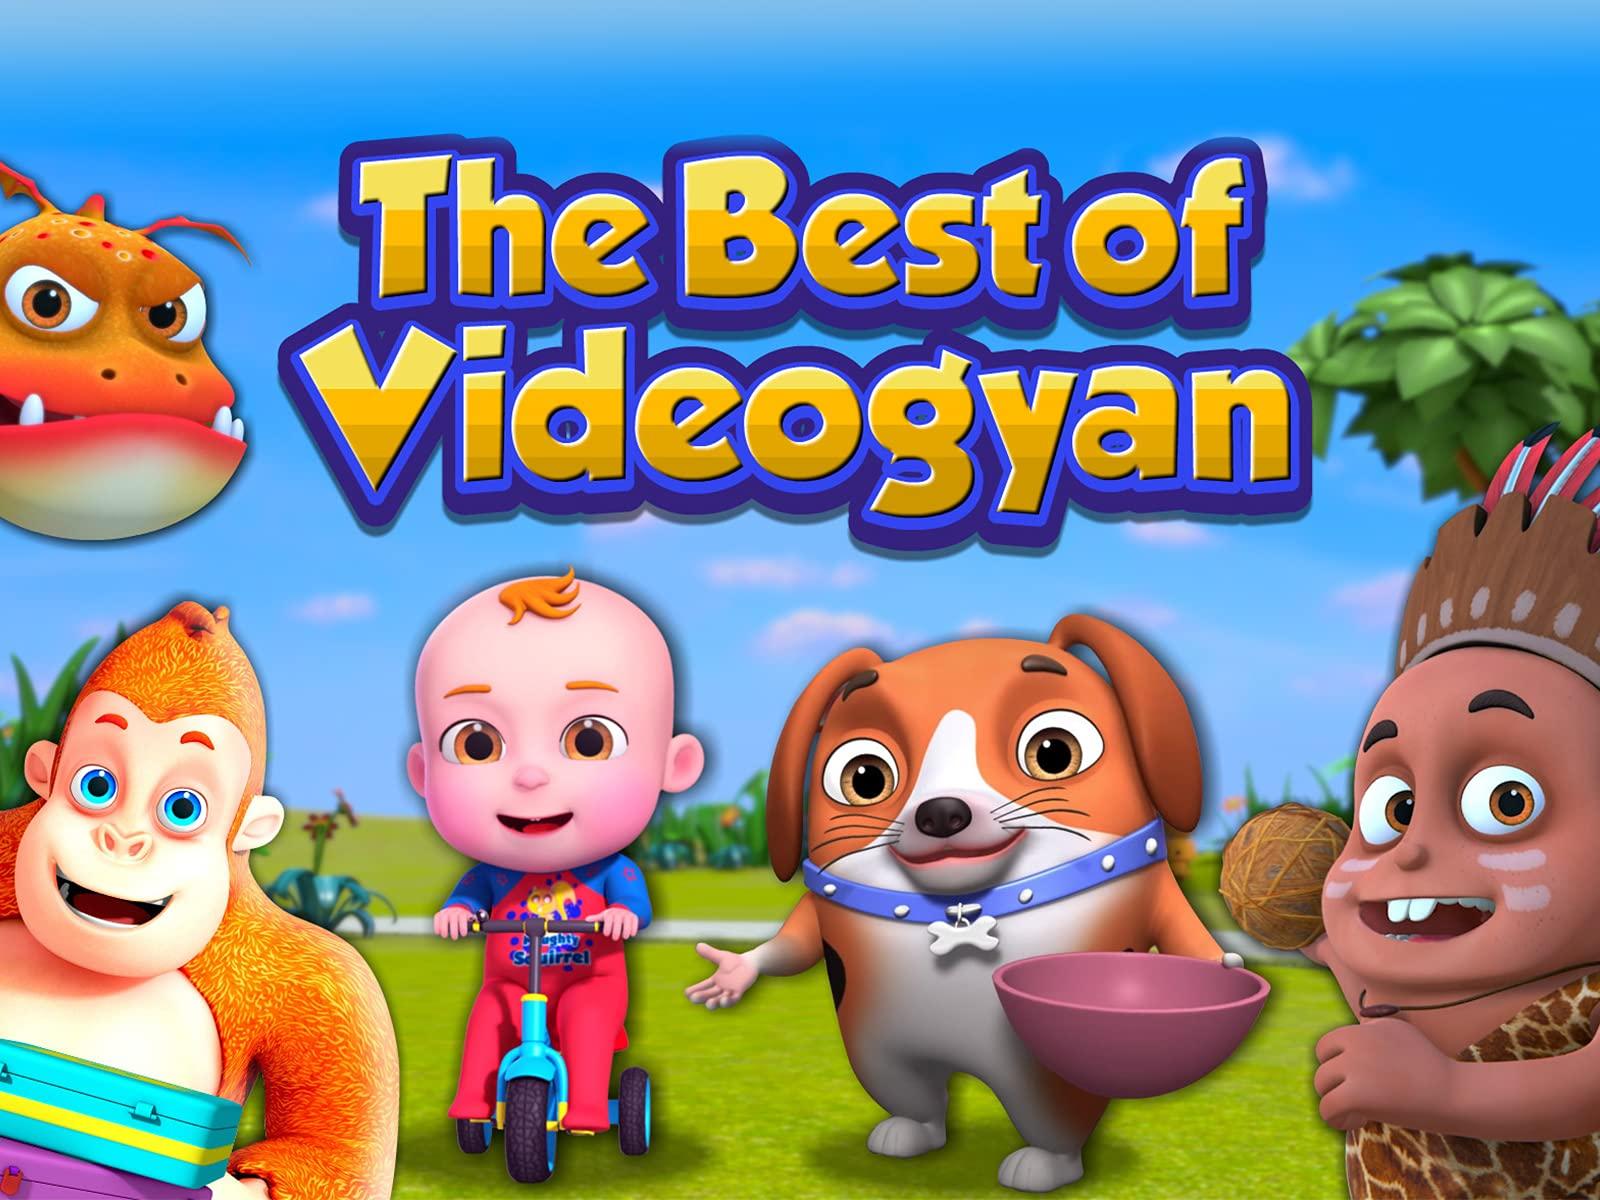 The Best of Videogyan - Season 1